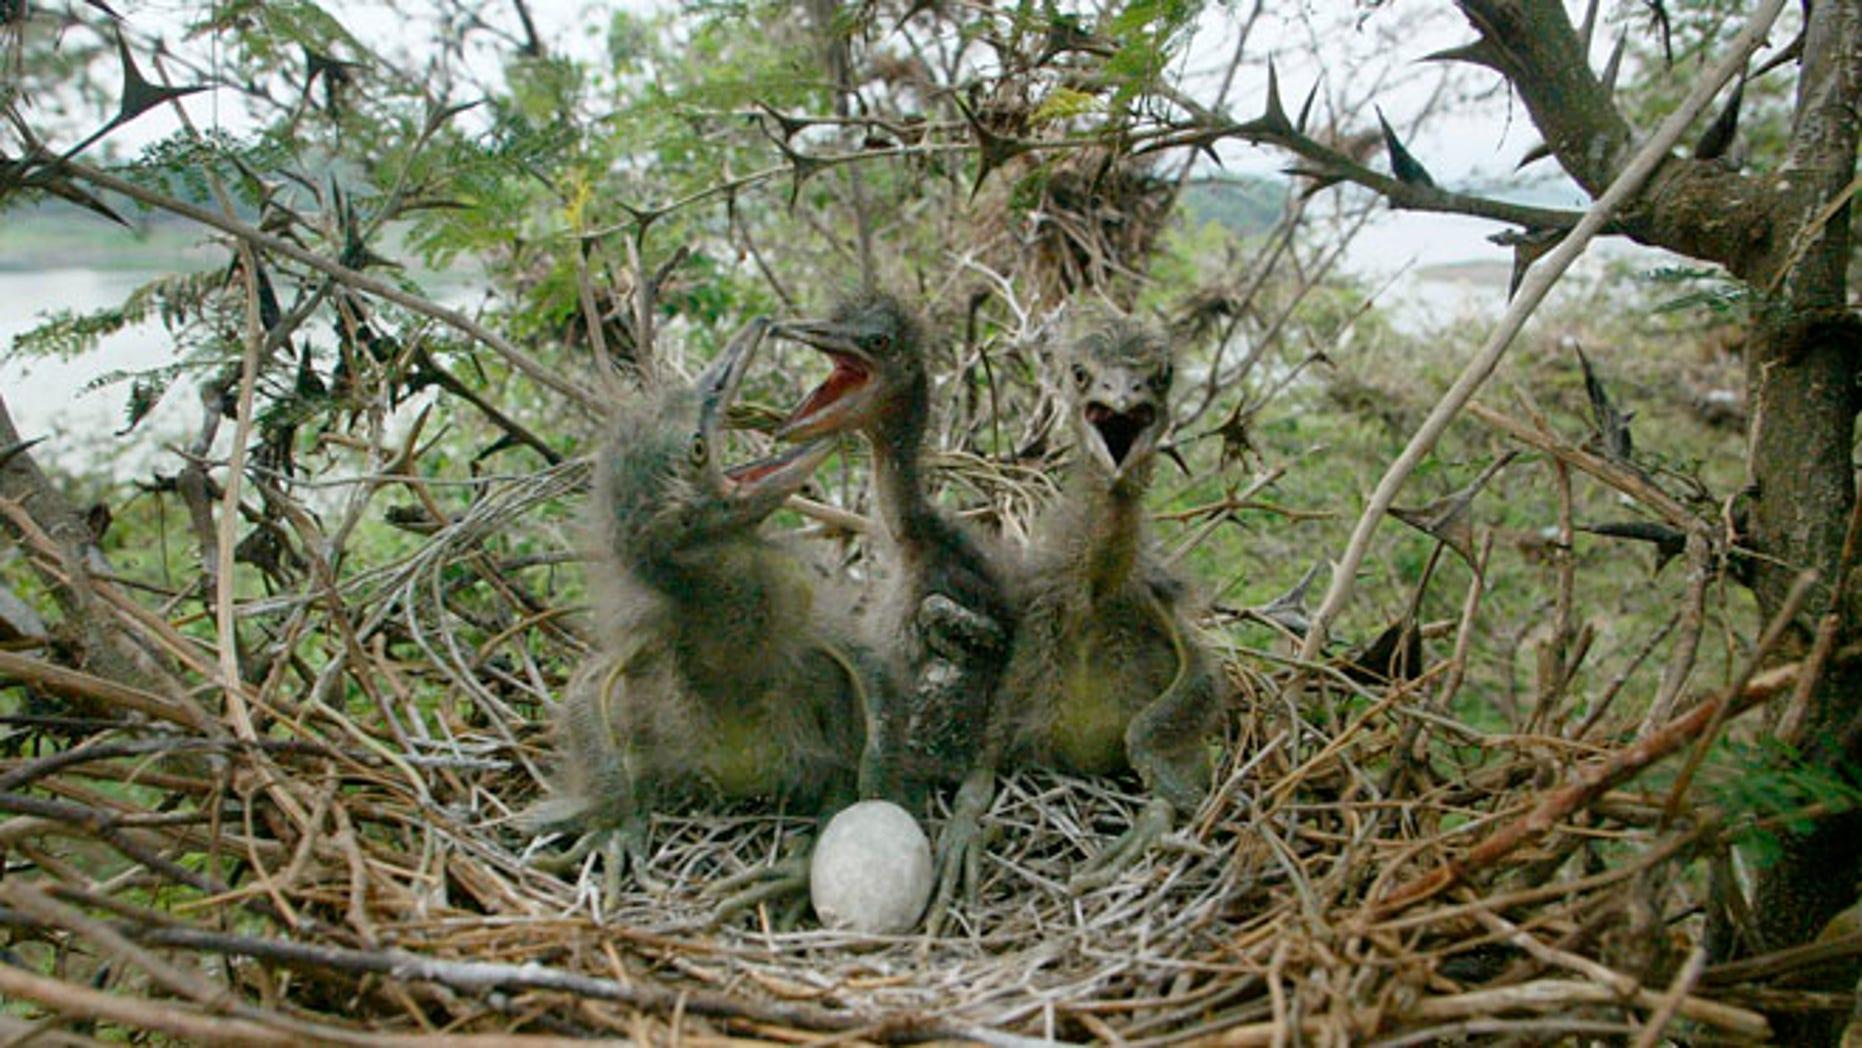 Night Heron chicks in a nest.